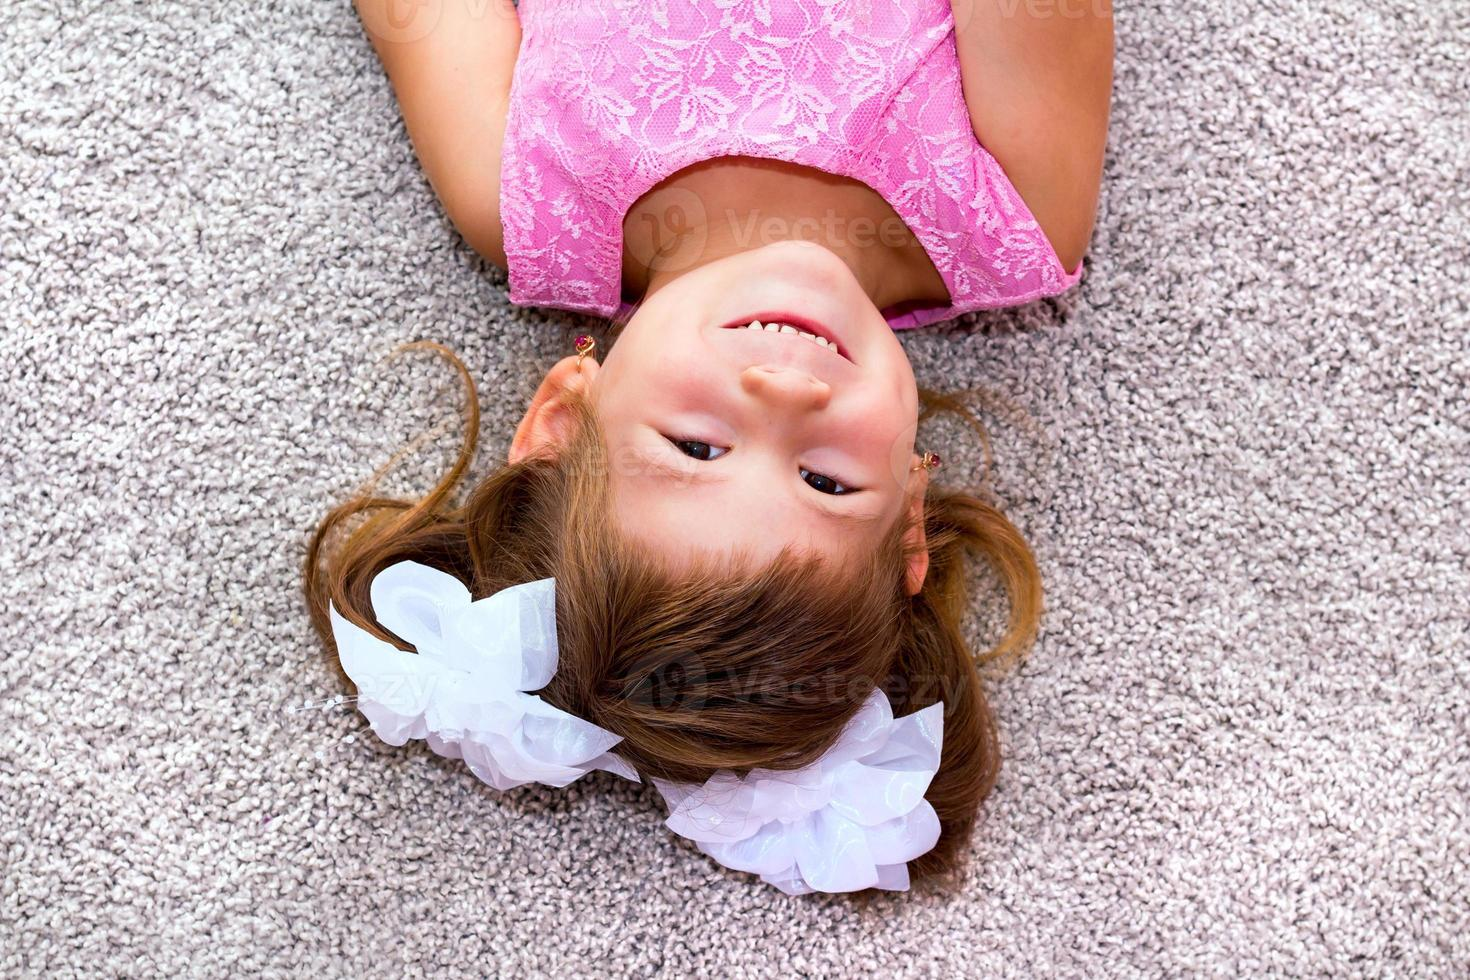 bambina sdraiata sul pavimento. foto